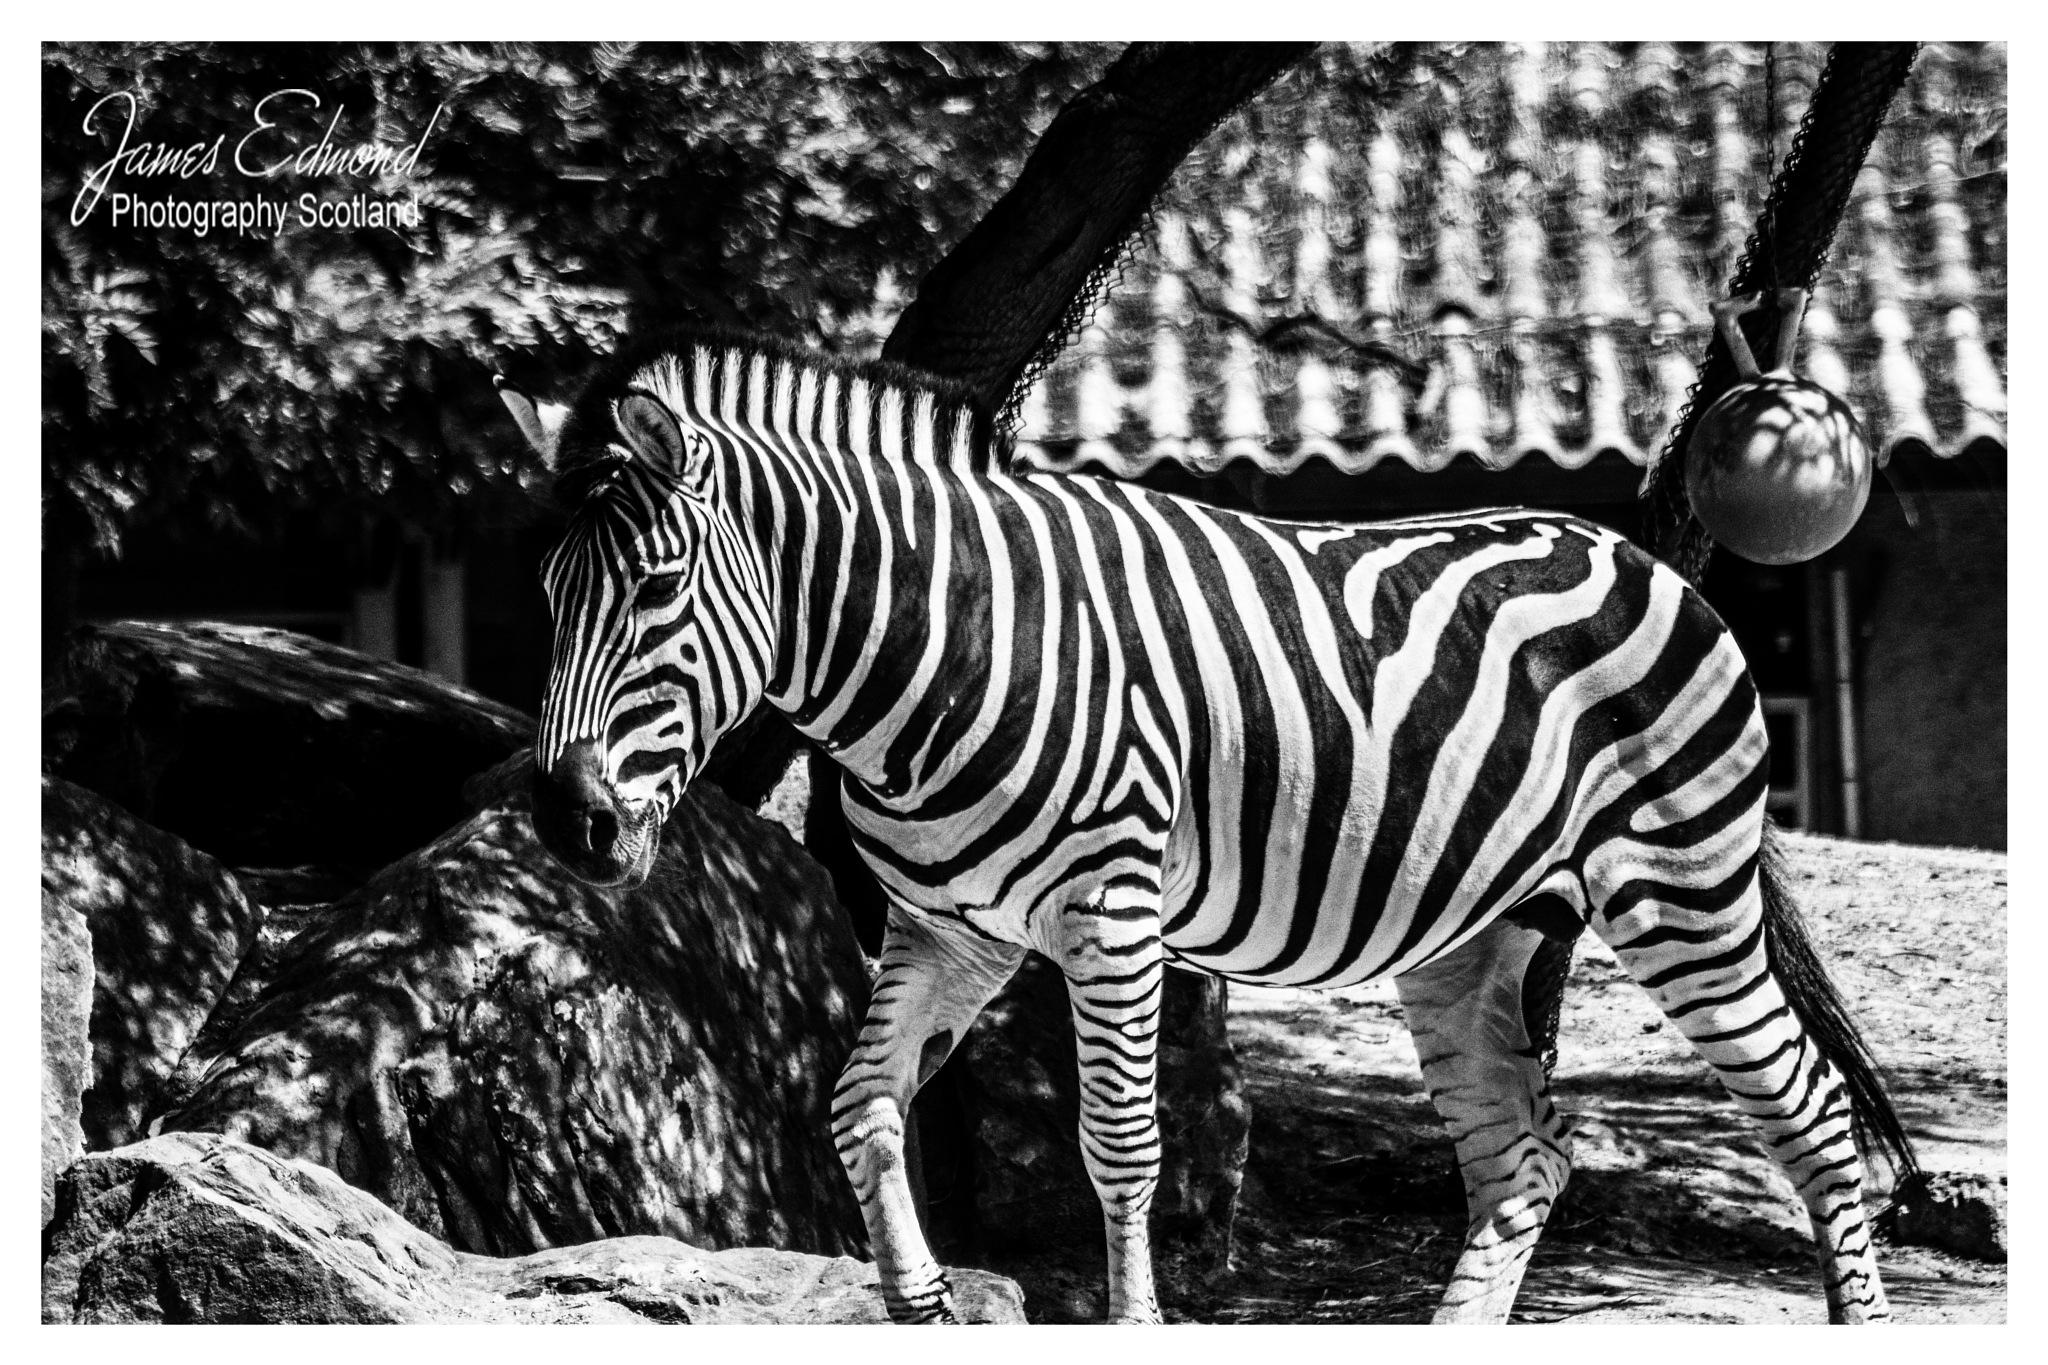 Zebra Strolling around .... by James Edmond Photography